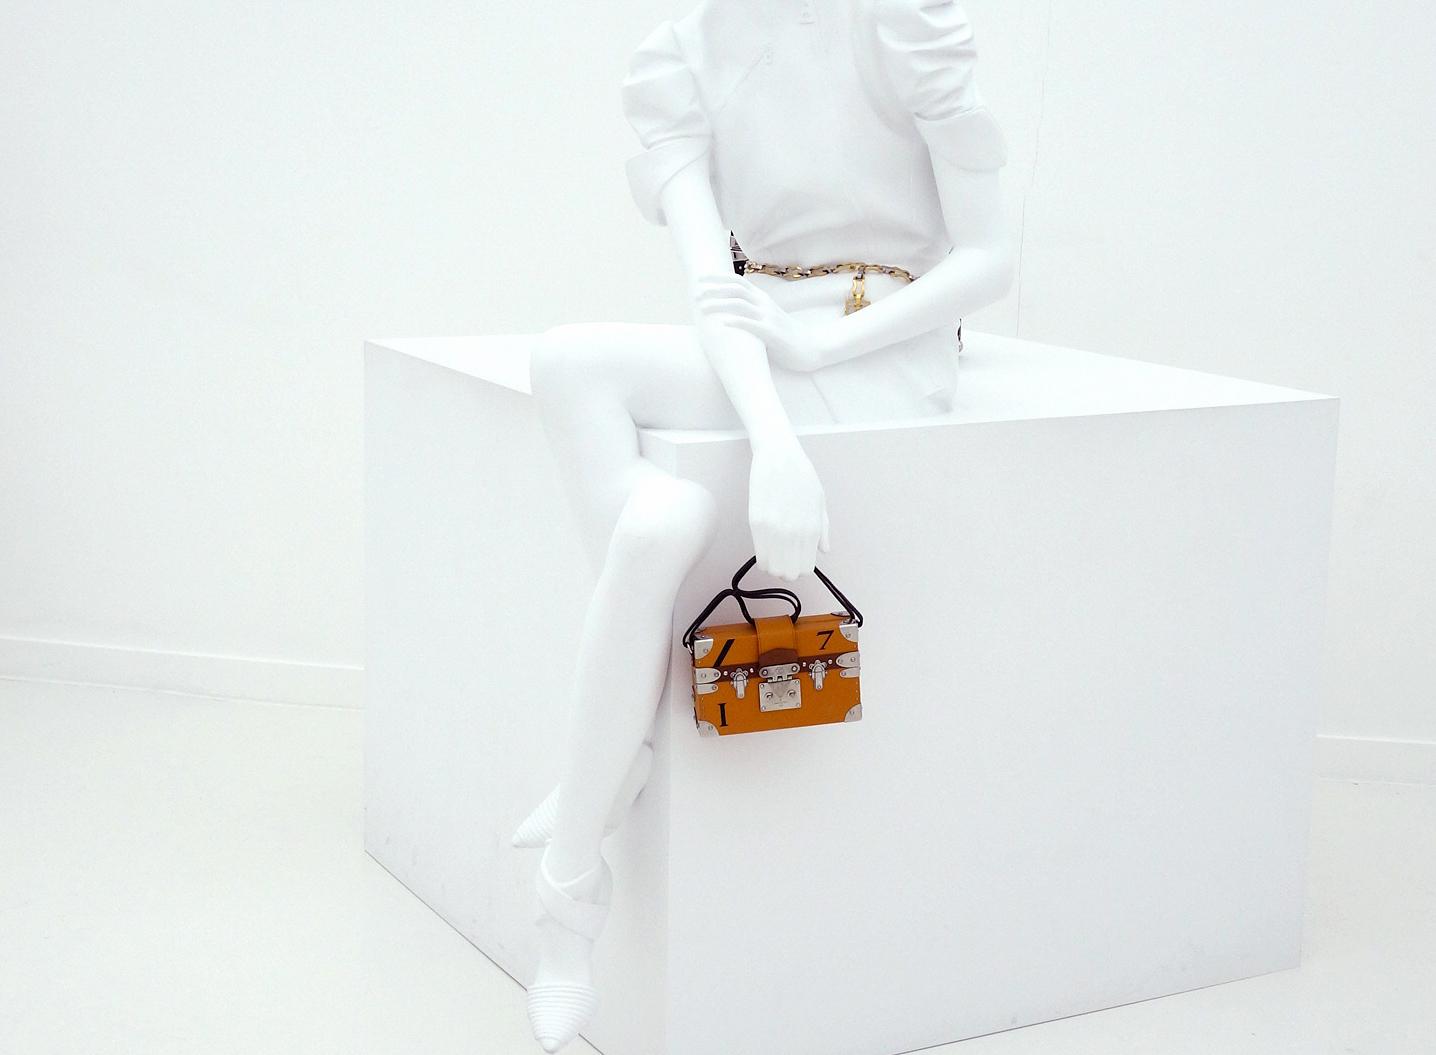 #LVSERIES3 Louis Vuitton Series 3 fashion exhibition in London / review & photos via www.fashionedbylove.co.uk British fashion blog